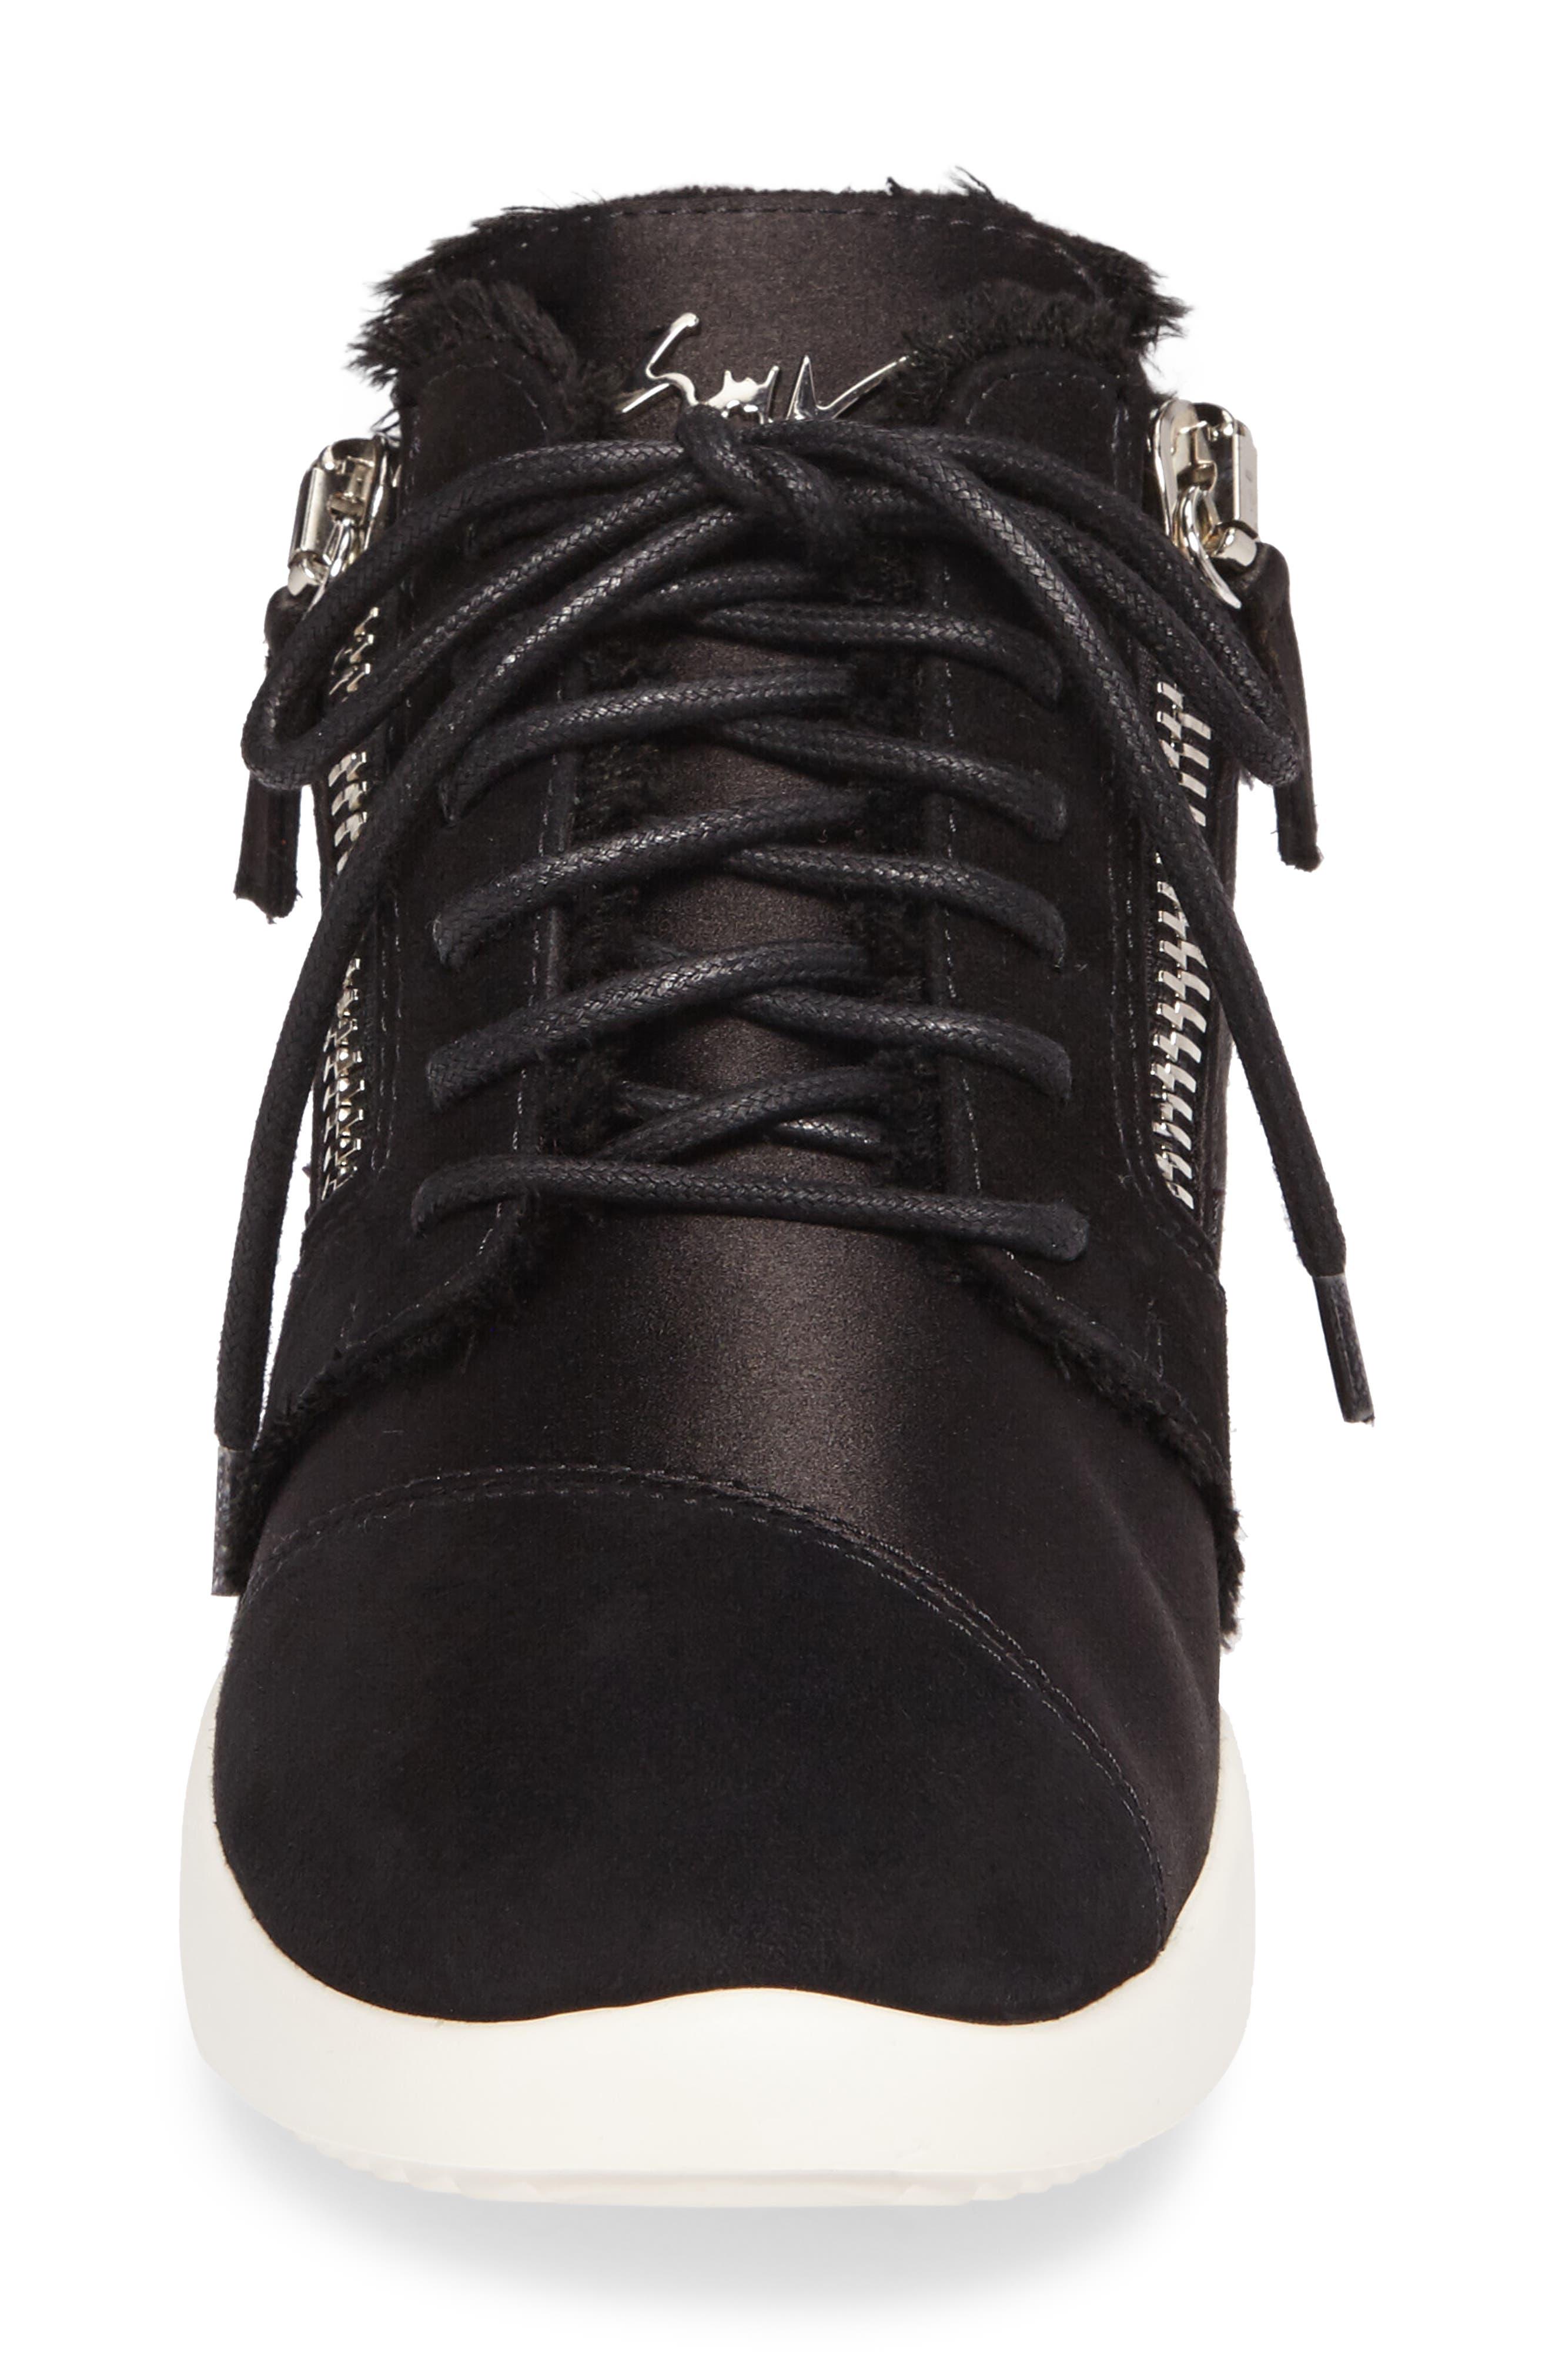 GIUSEPPE ZANOTTI,                             Swarovski Crystal Embellished Sneaker,                             Alternate thumbnail 4, color,                             001